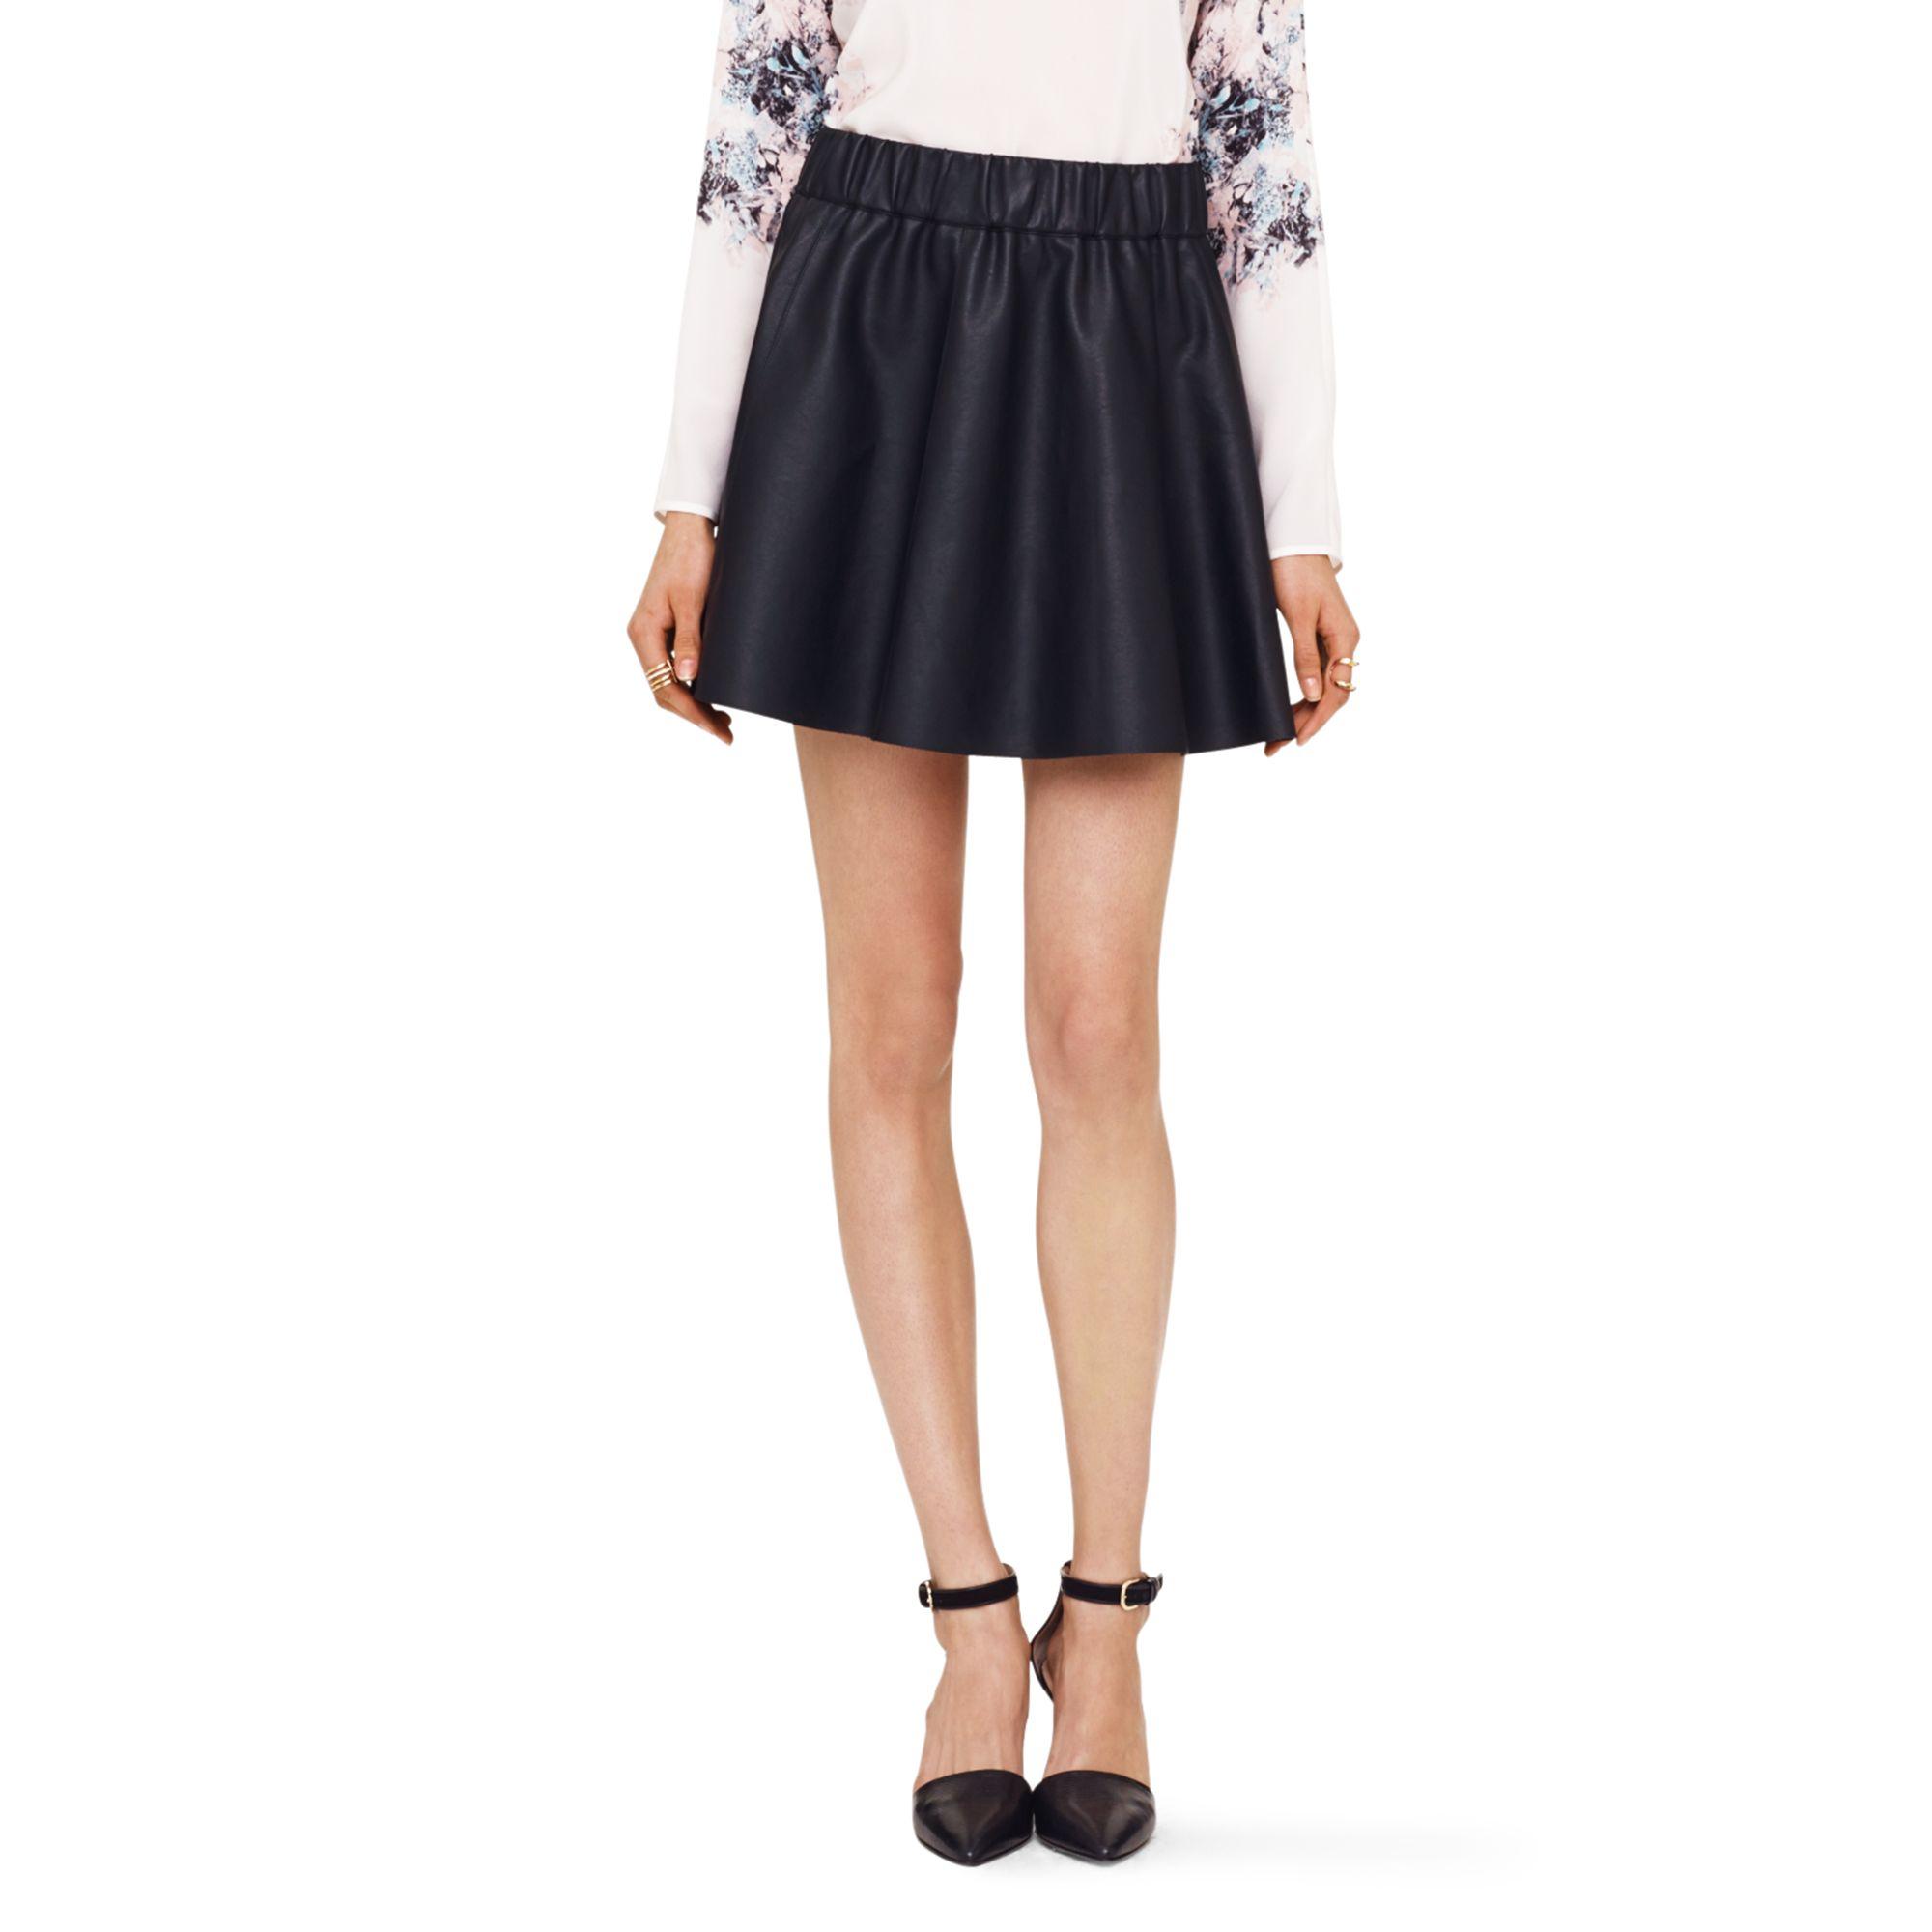 Club monaco Lyn Faux-Leather Skirt in Black | Lyst